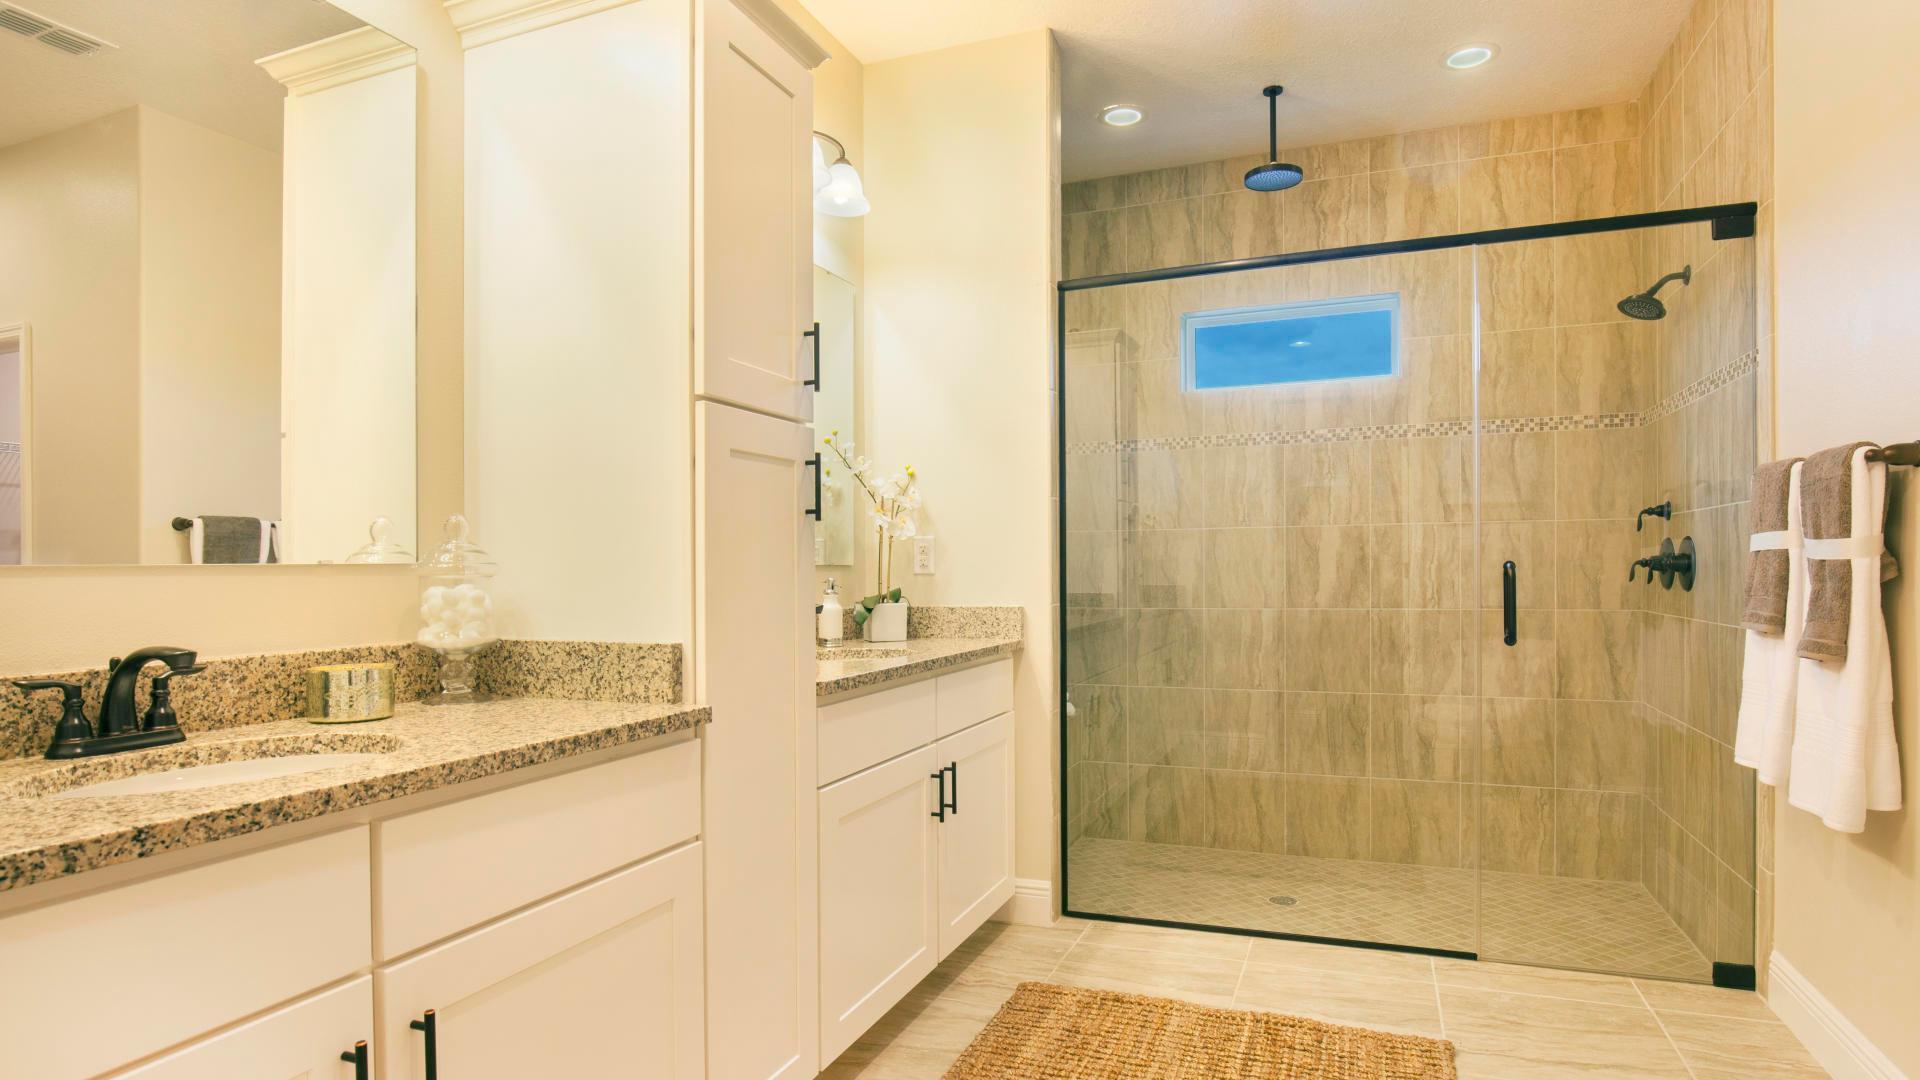 Bathroom featured in the Livorno By Maronda Homes in Melbourne, FL